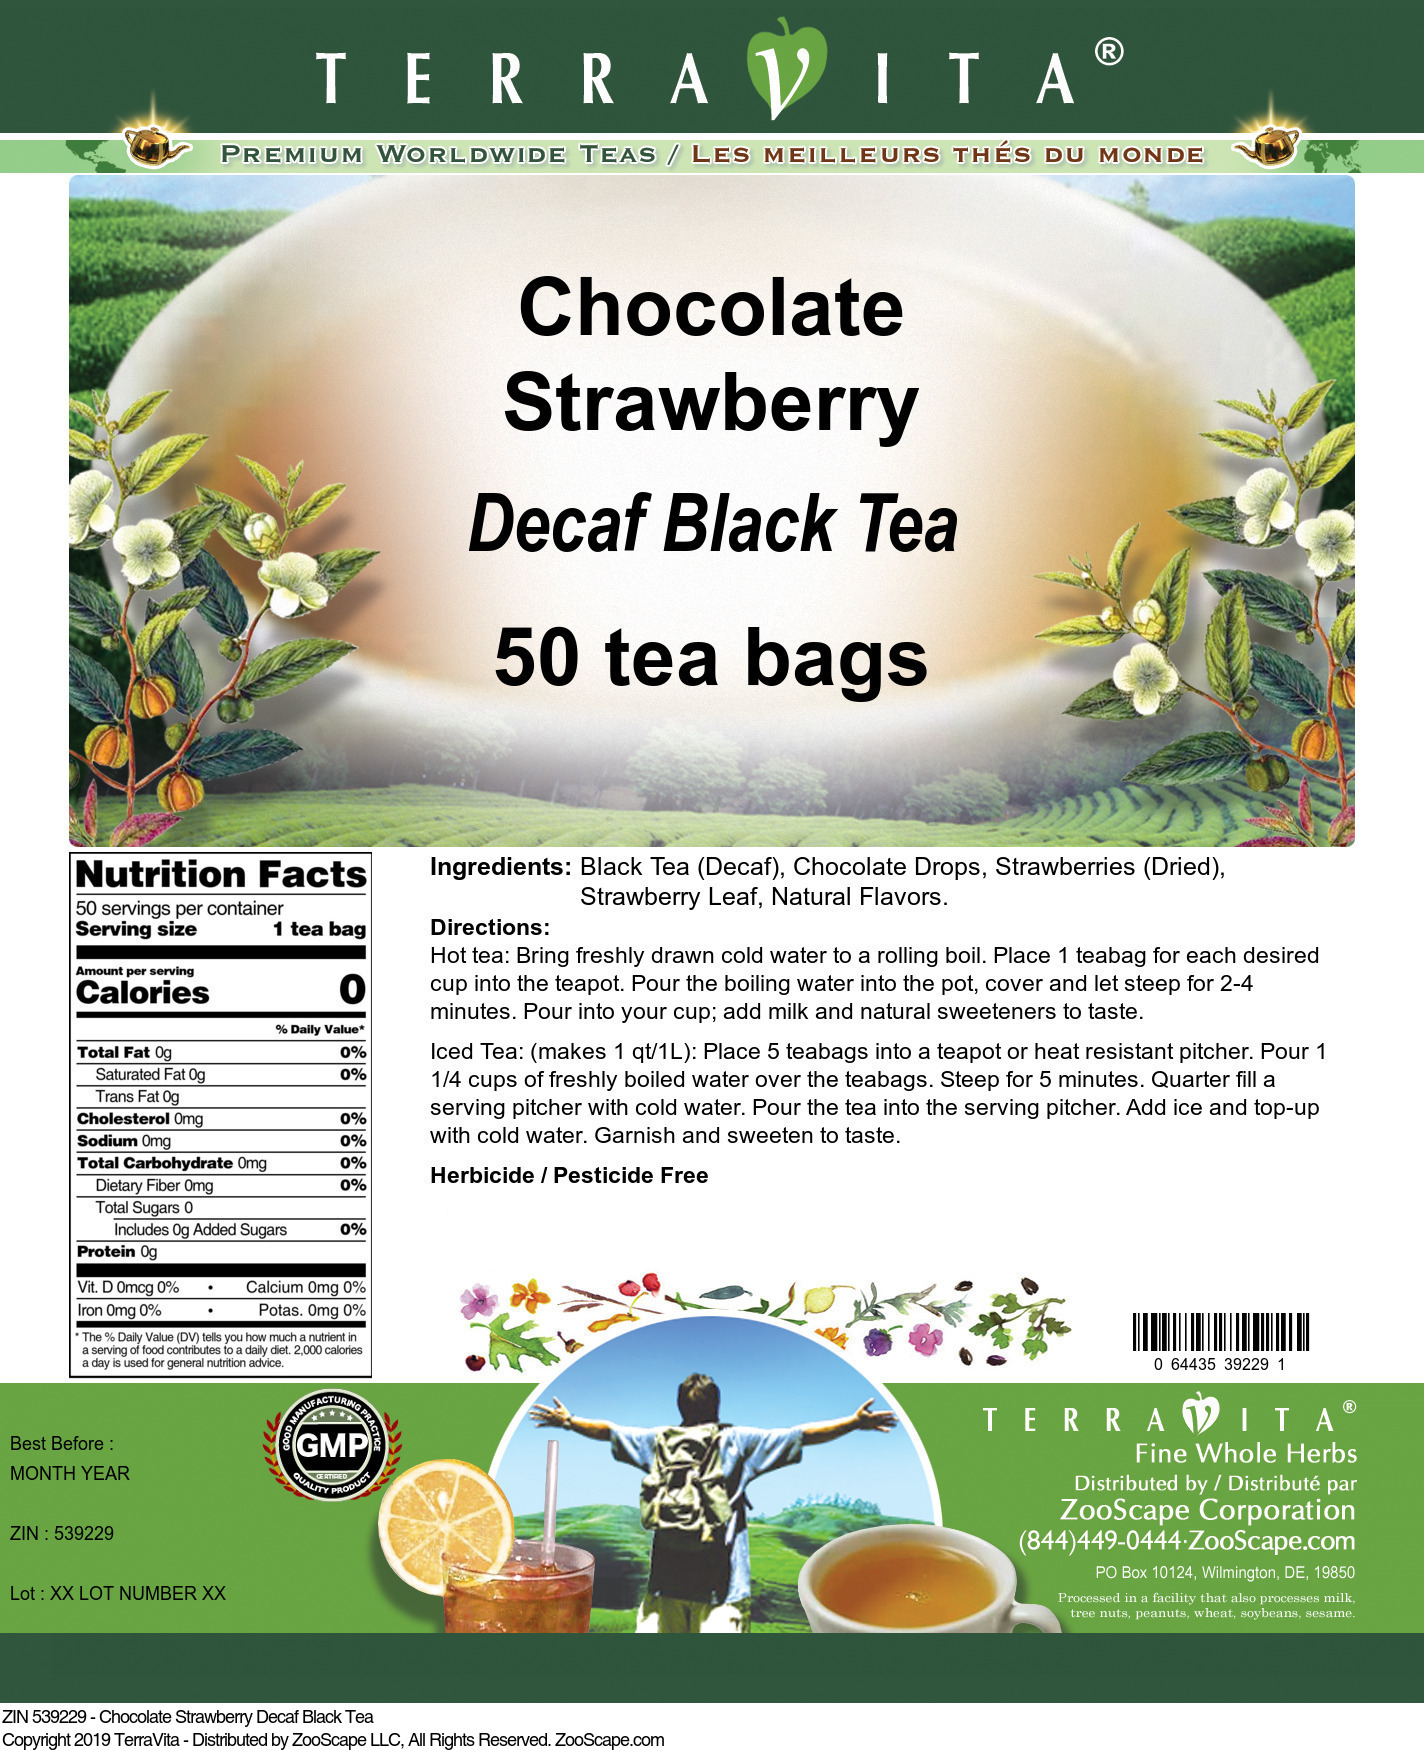 Chocolate Strawberry Decaf Black Tea